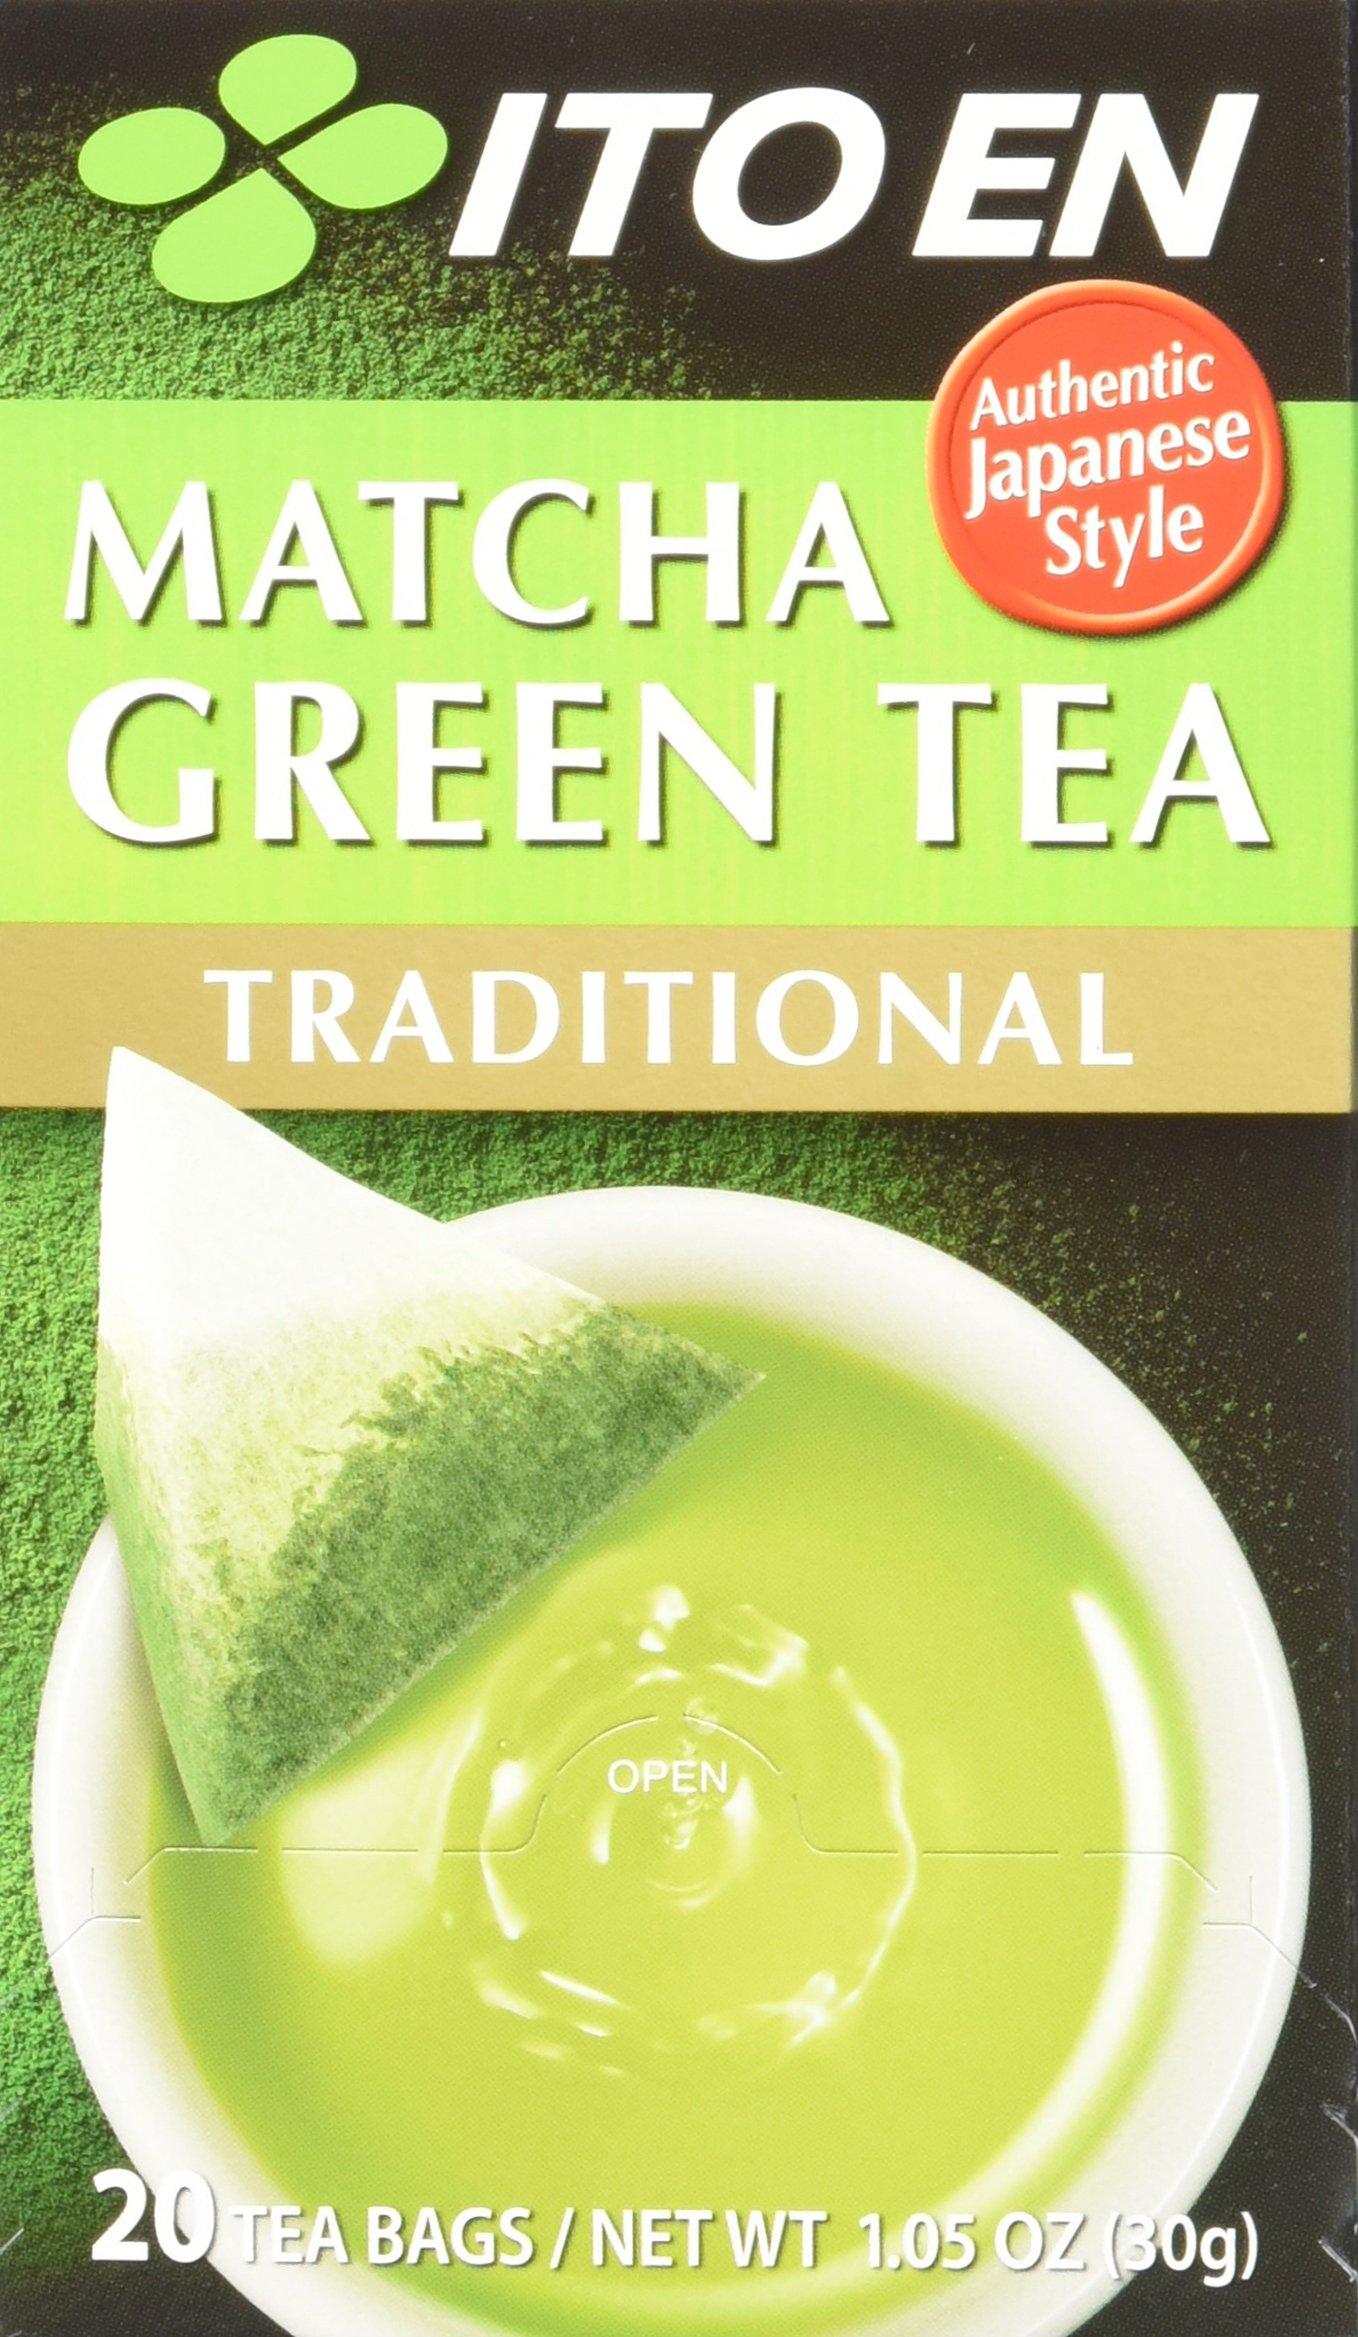 Ito En Matcha Green Tea Traditional 20Count (Pack of 8) Zero Calorie No Artificial Sweeteners Caffeinated Good Source of Vitamin C & Antioxidants BPA Free